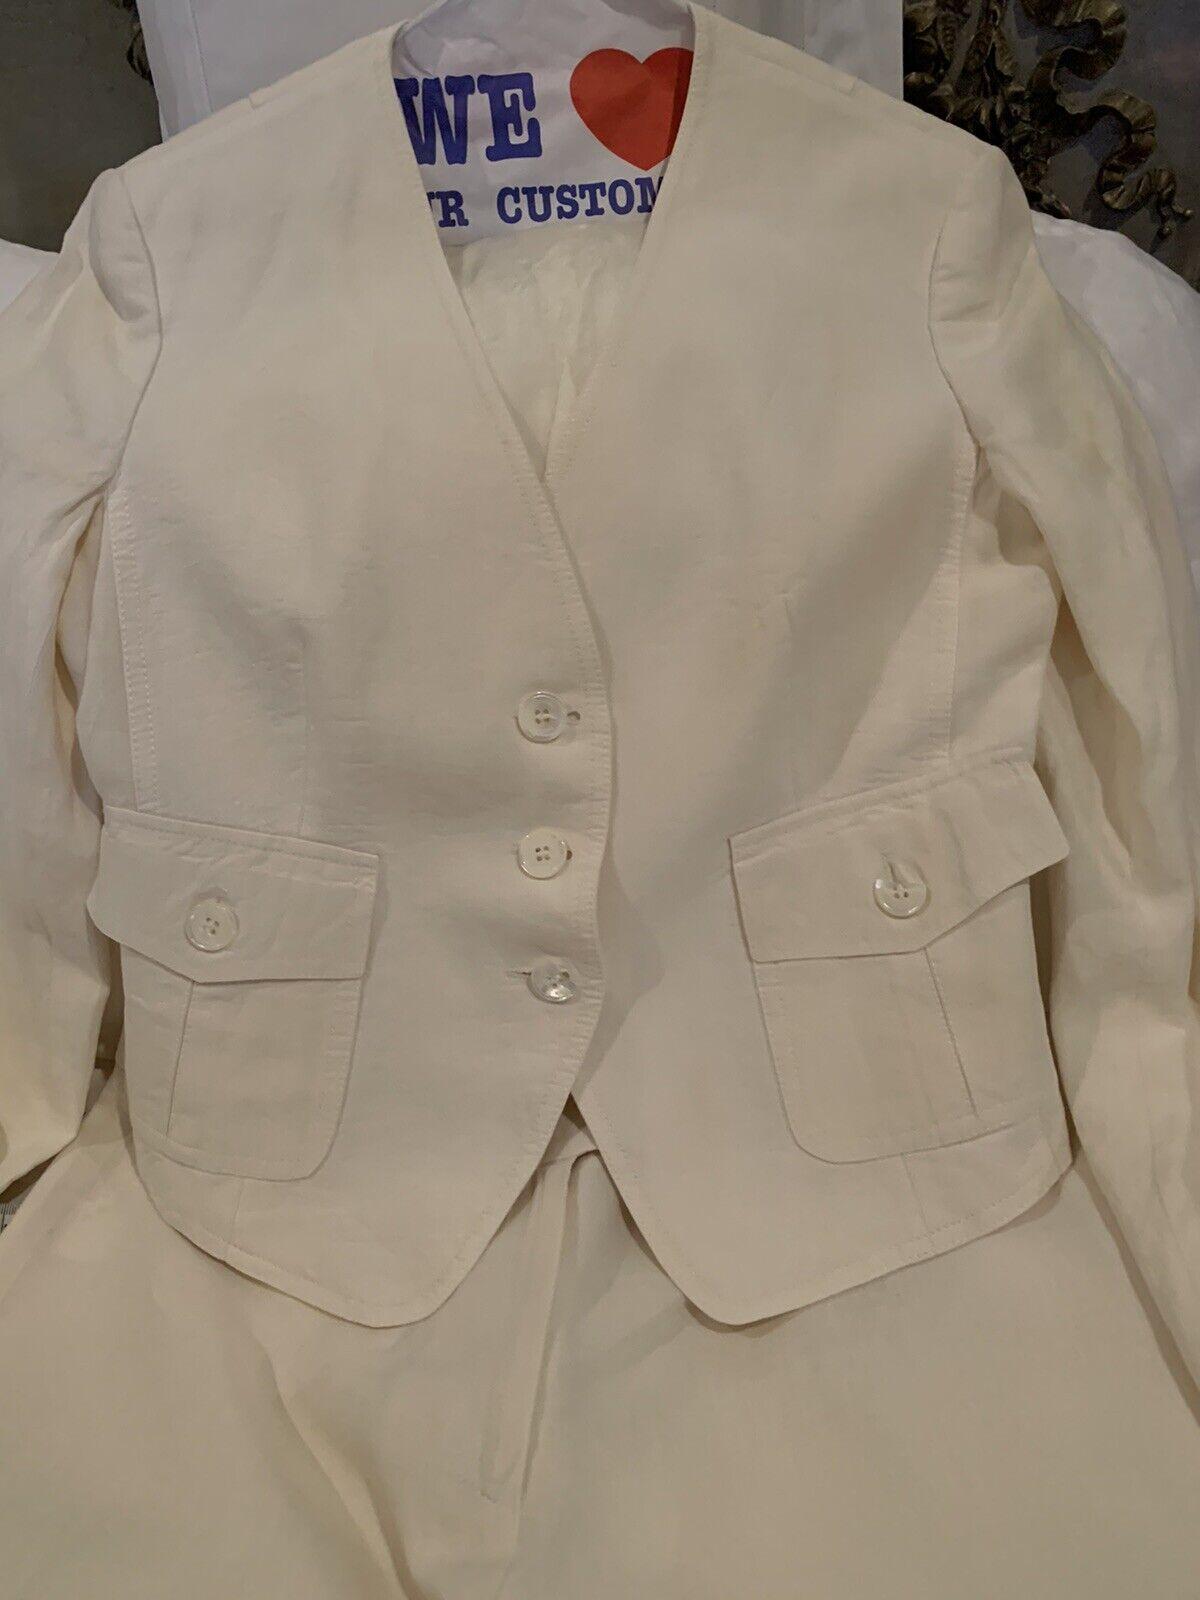 Cream Linen Michael Kors Suit - image 2